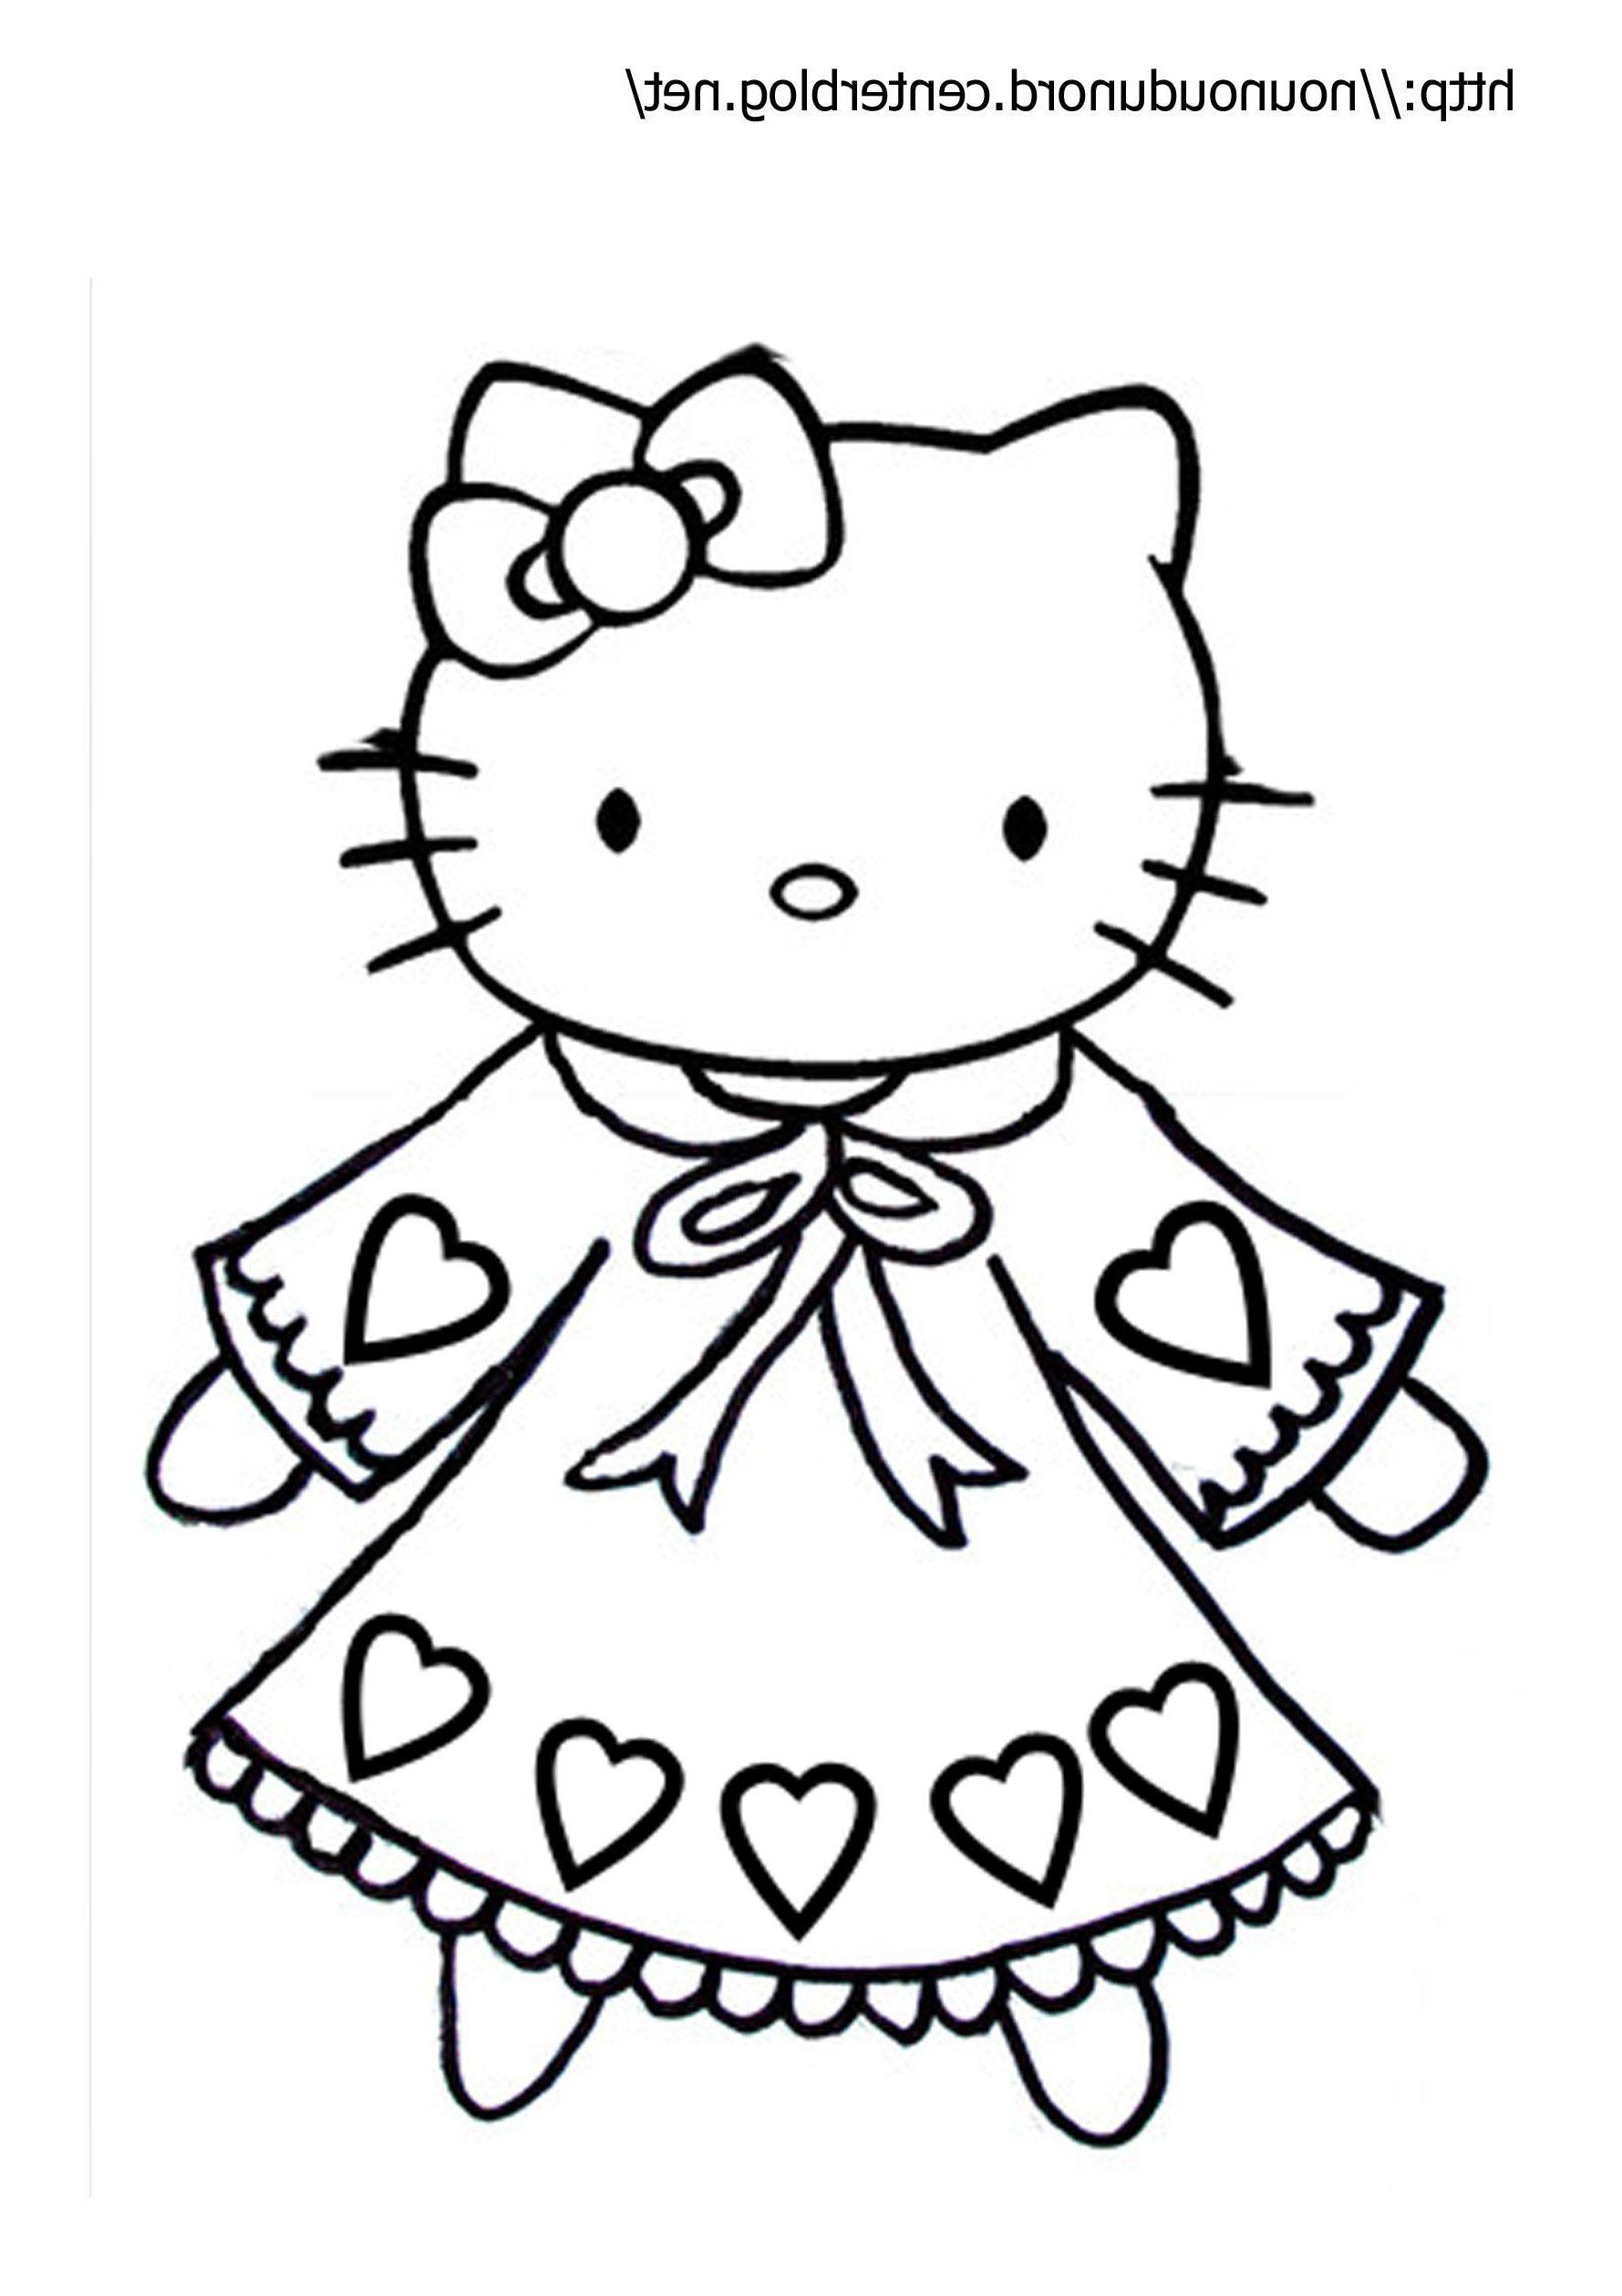 13 Minimaliste Coloriage Hello Kitty Princesse Images En 2021 Coloriage Hello Kitty Coloriage A Imprimer Coloriage Enfant